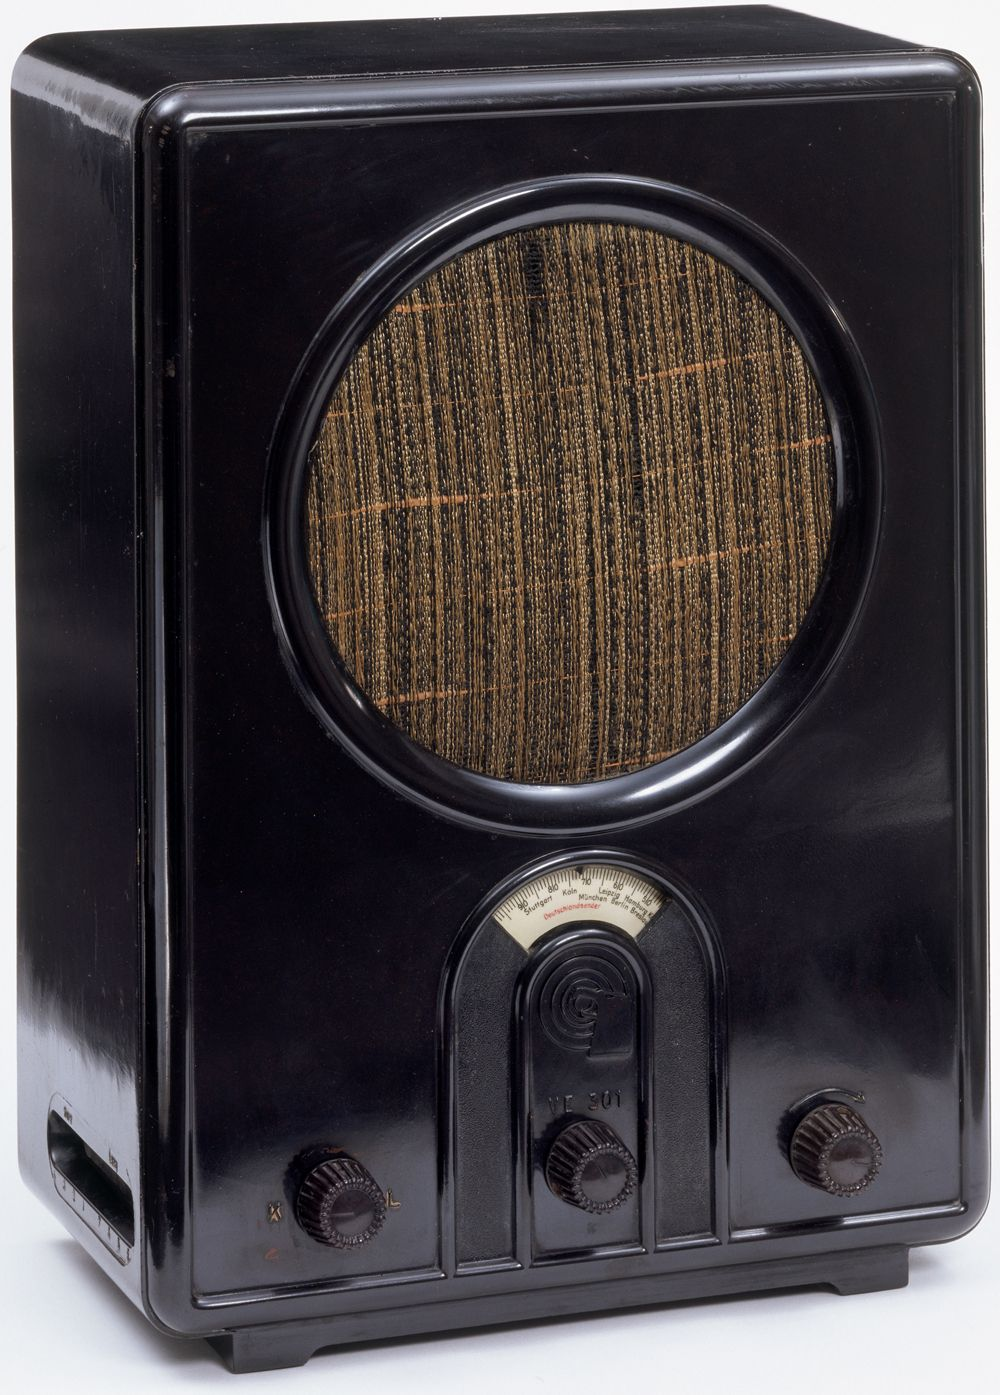 'Volksempfänger radio VE 301 W', Walter Maria Kersting